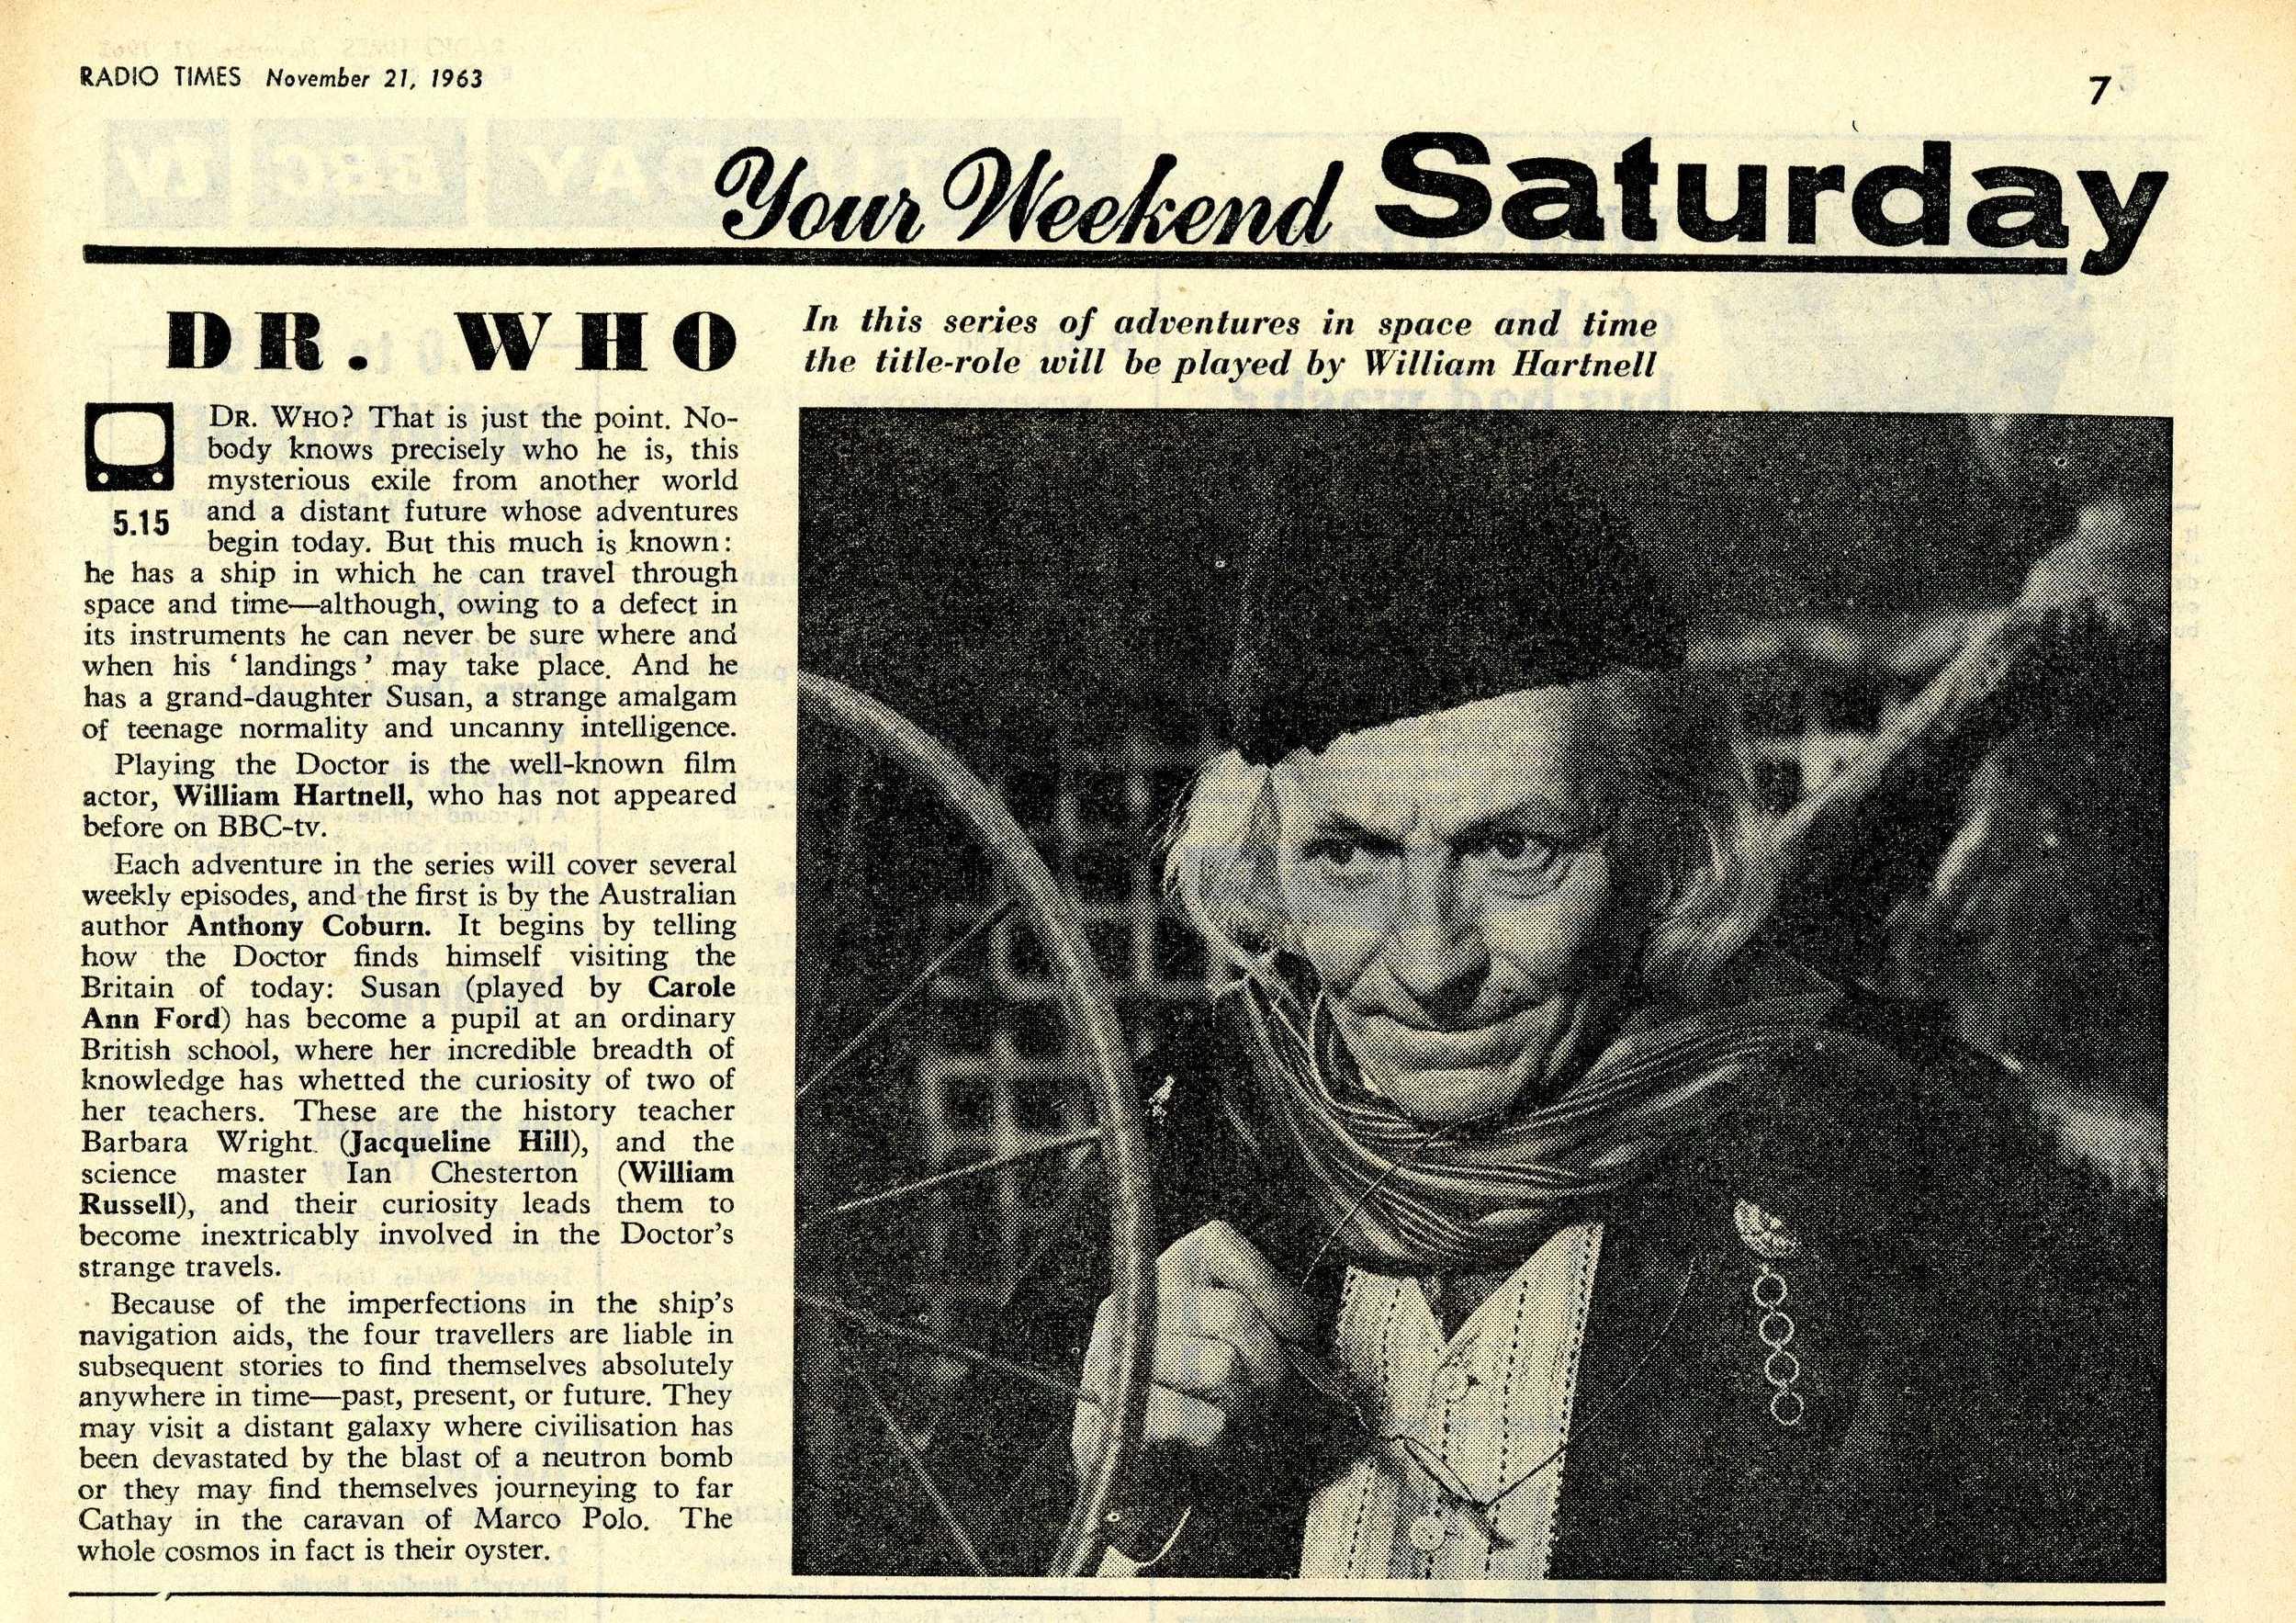 Radio Times, 23-29 November 1963